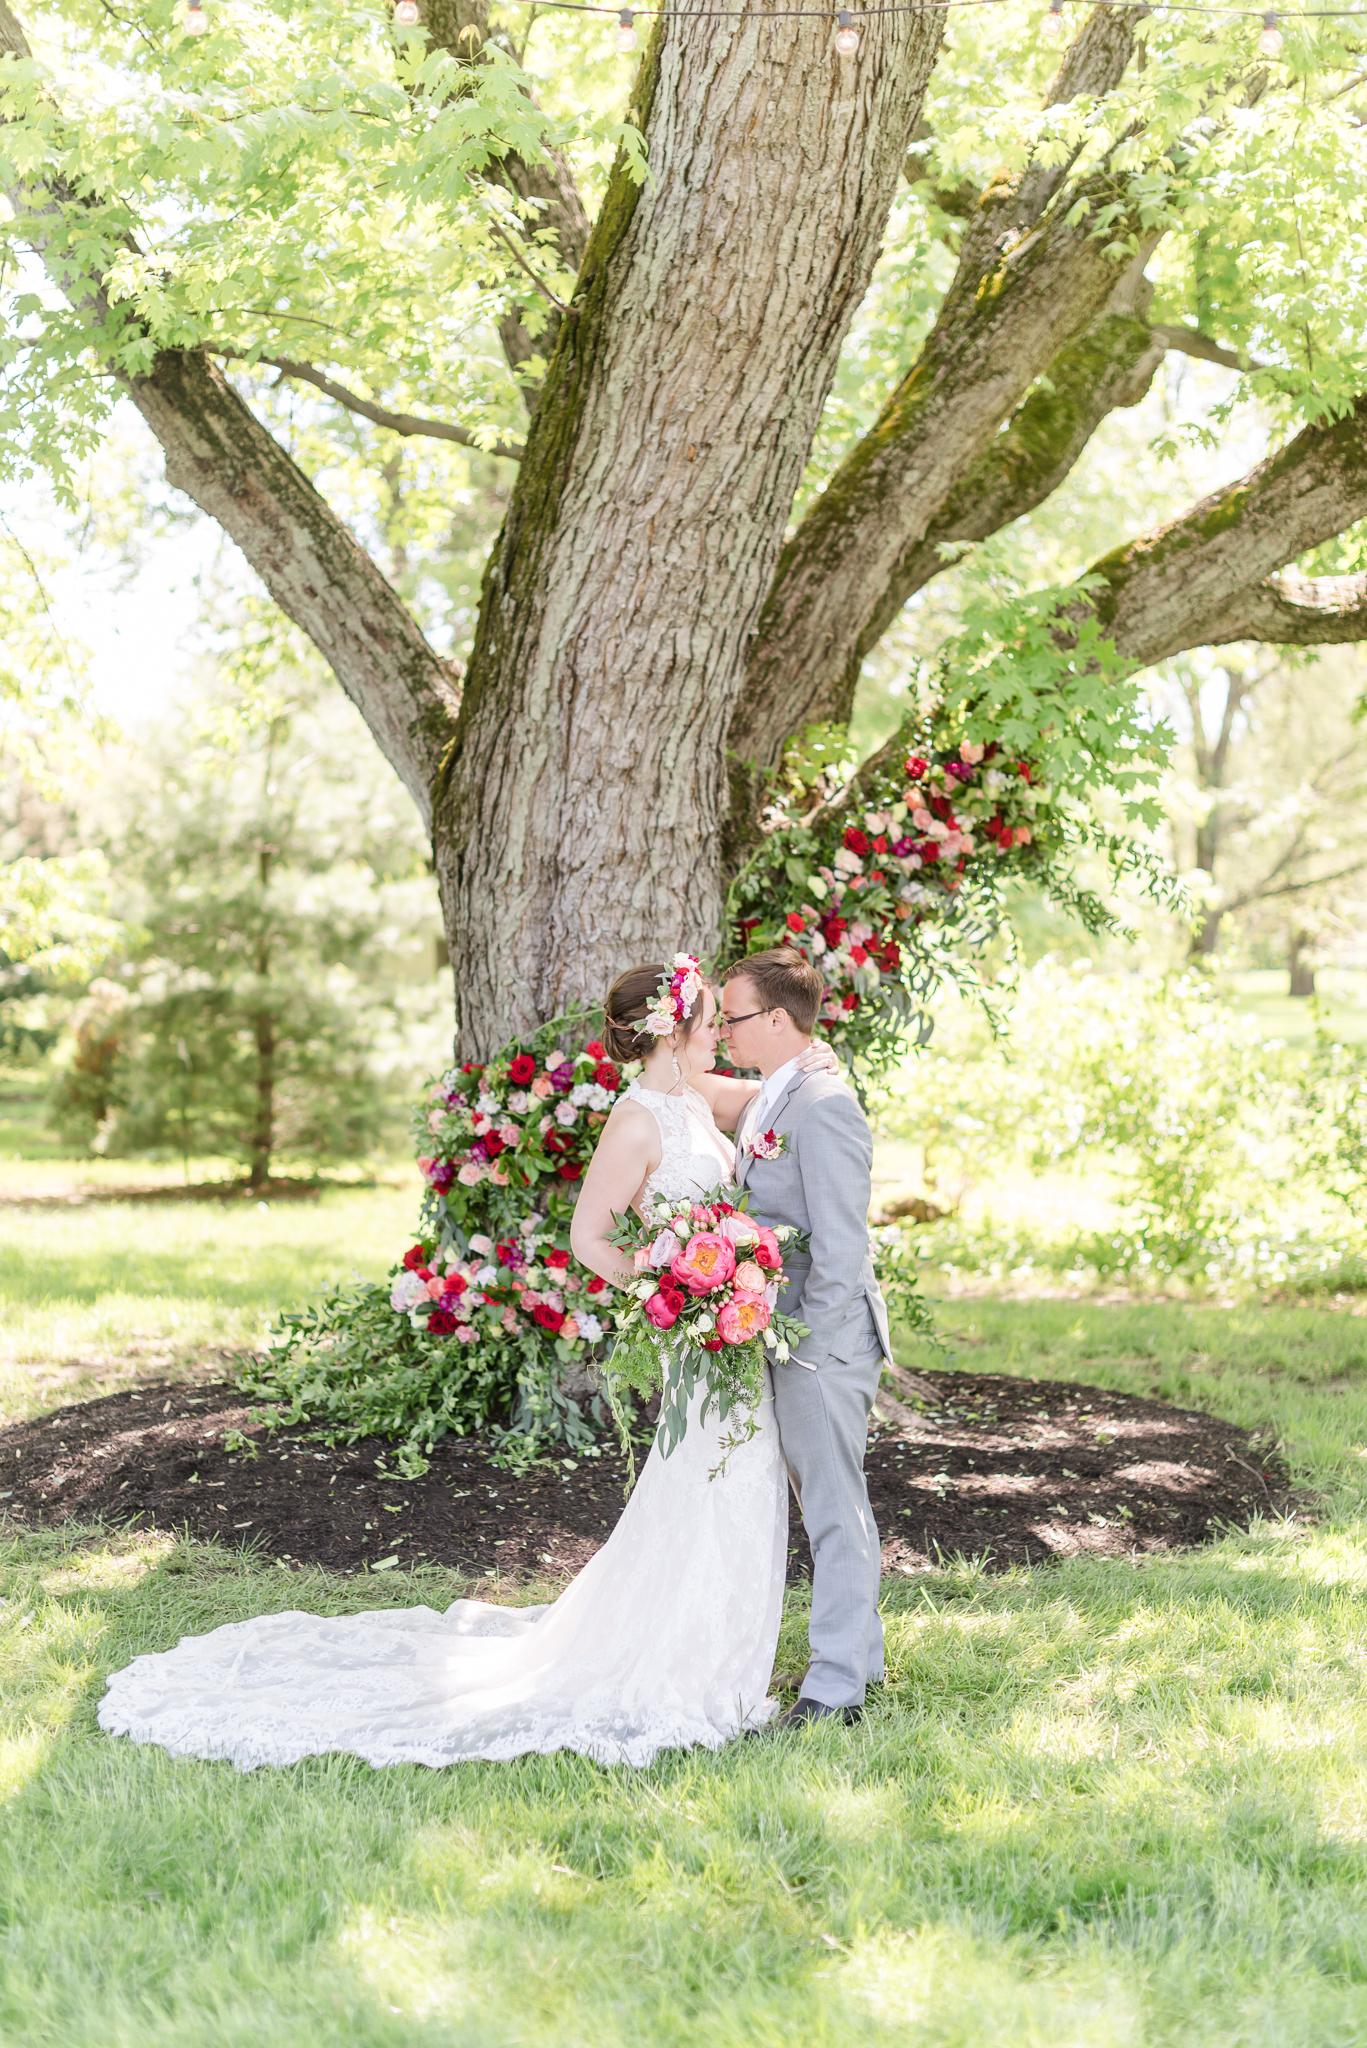 Mustard Seed Gardens Wedding Indianapolis Noblesvile Fishers Wedding Photographer-48.jpg